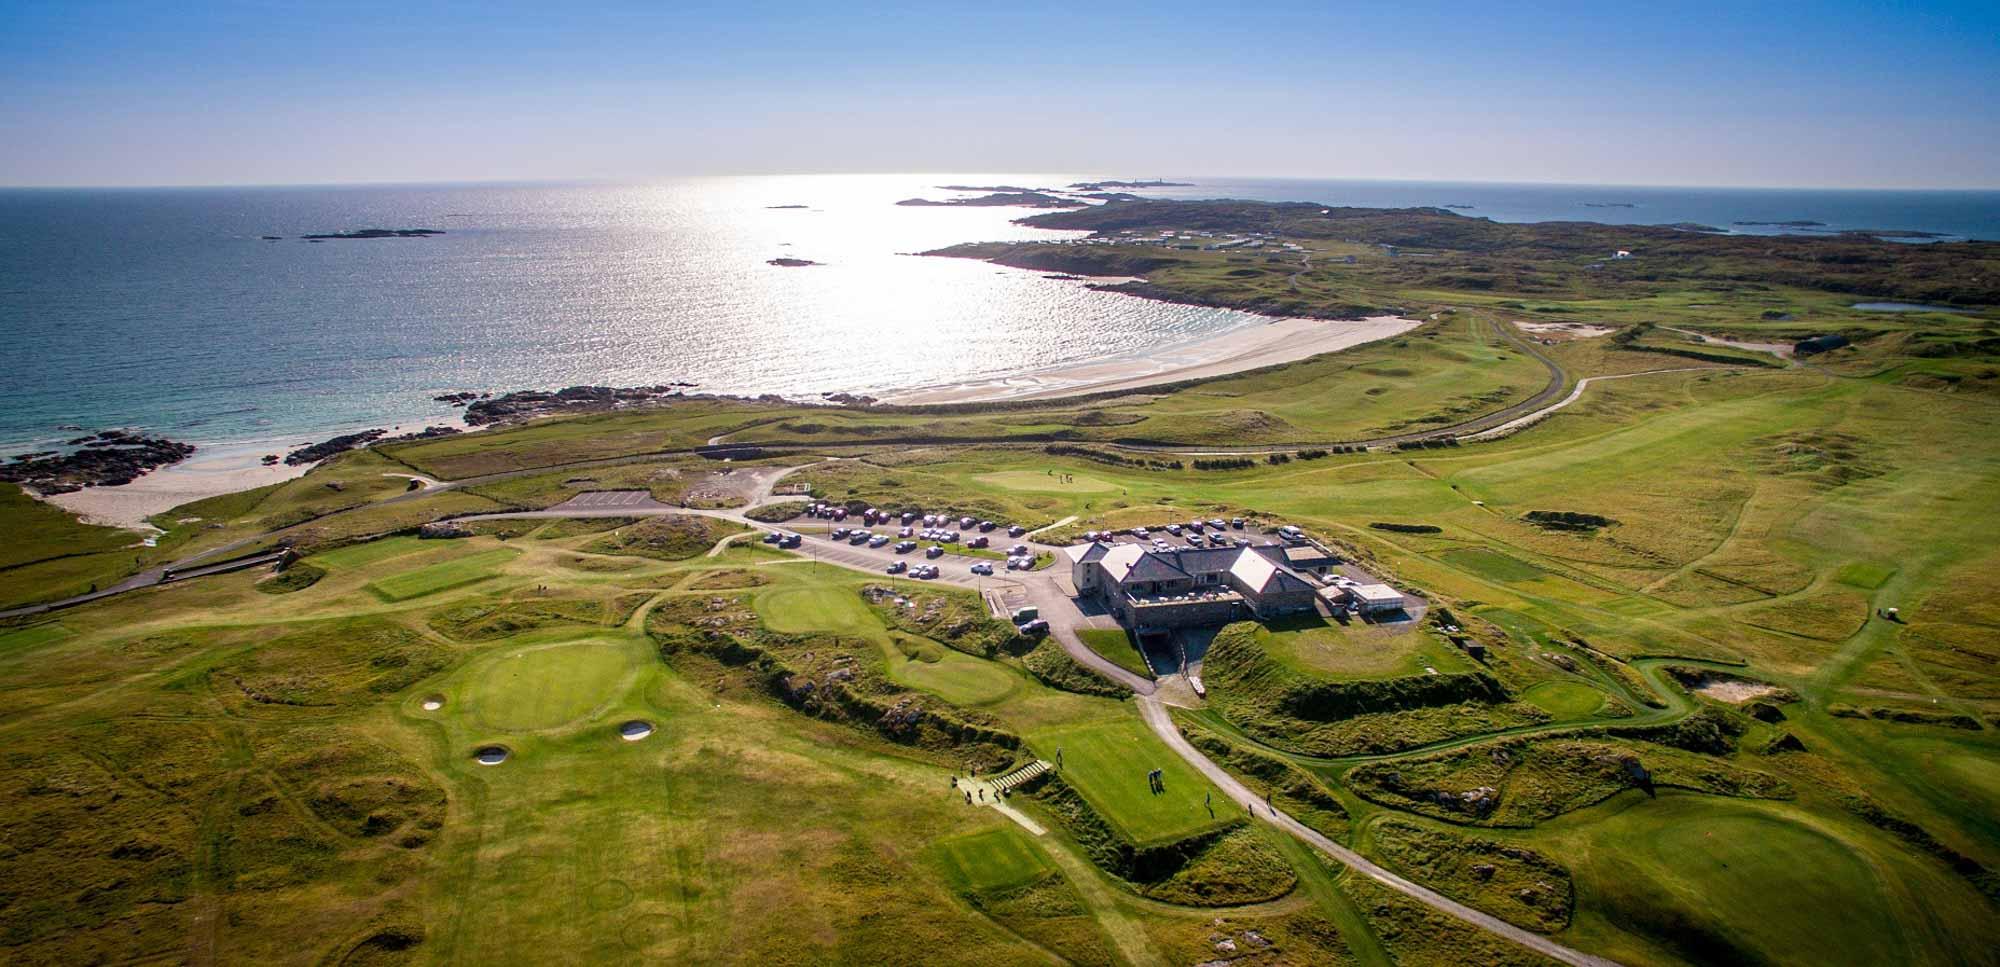 Connemara Championship Golf Links with views of the WIld Atlantic Way.